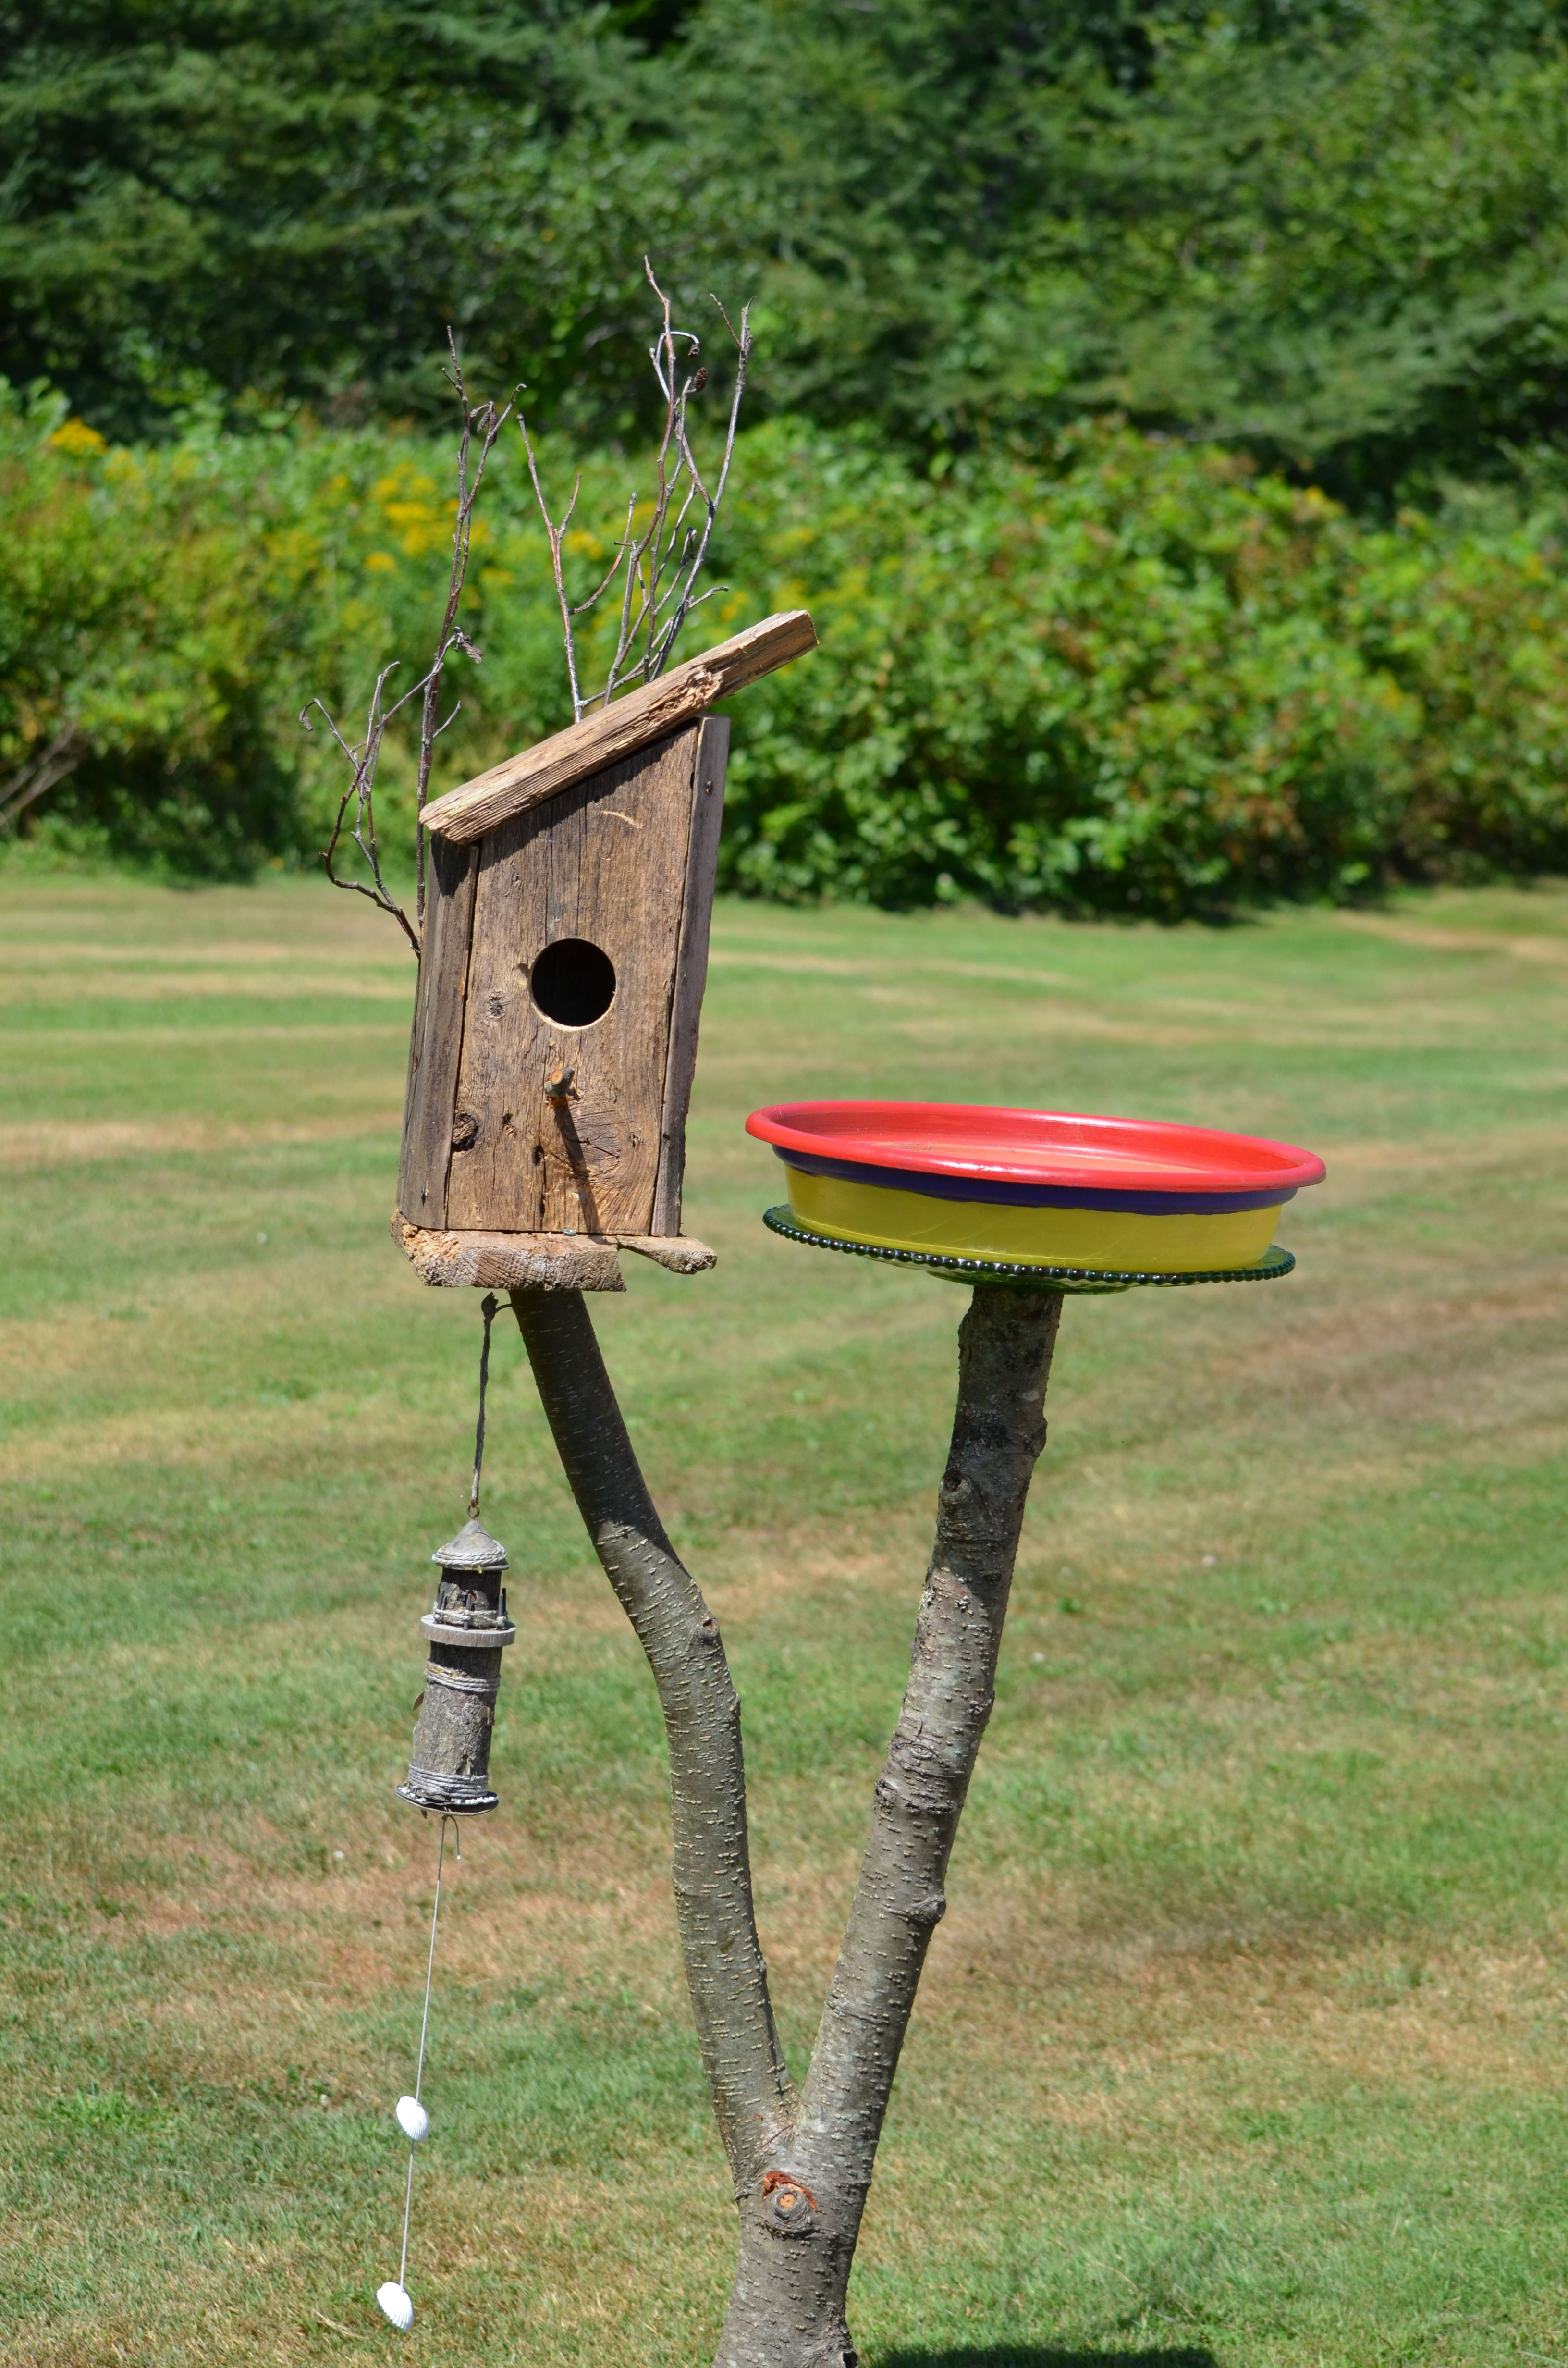 Birdhouse constructed of wood bird house design free standing bird - Bird Out House Made From Old Wood Pallets A Bird Bath